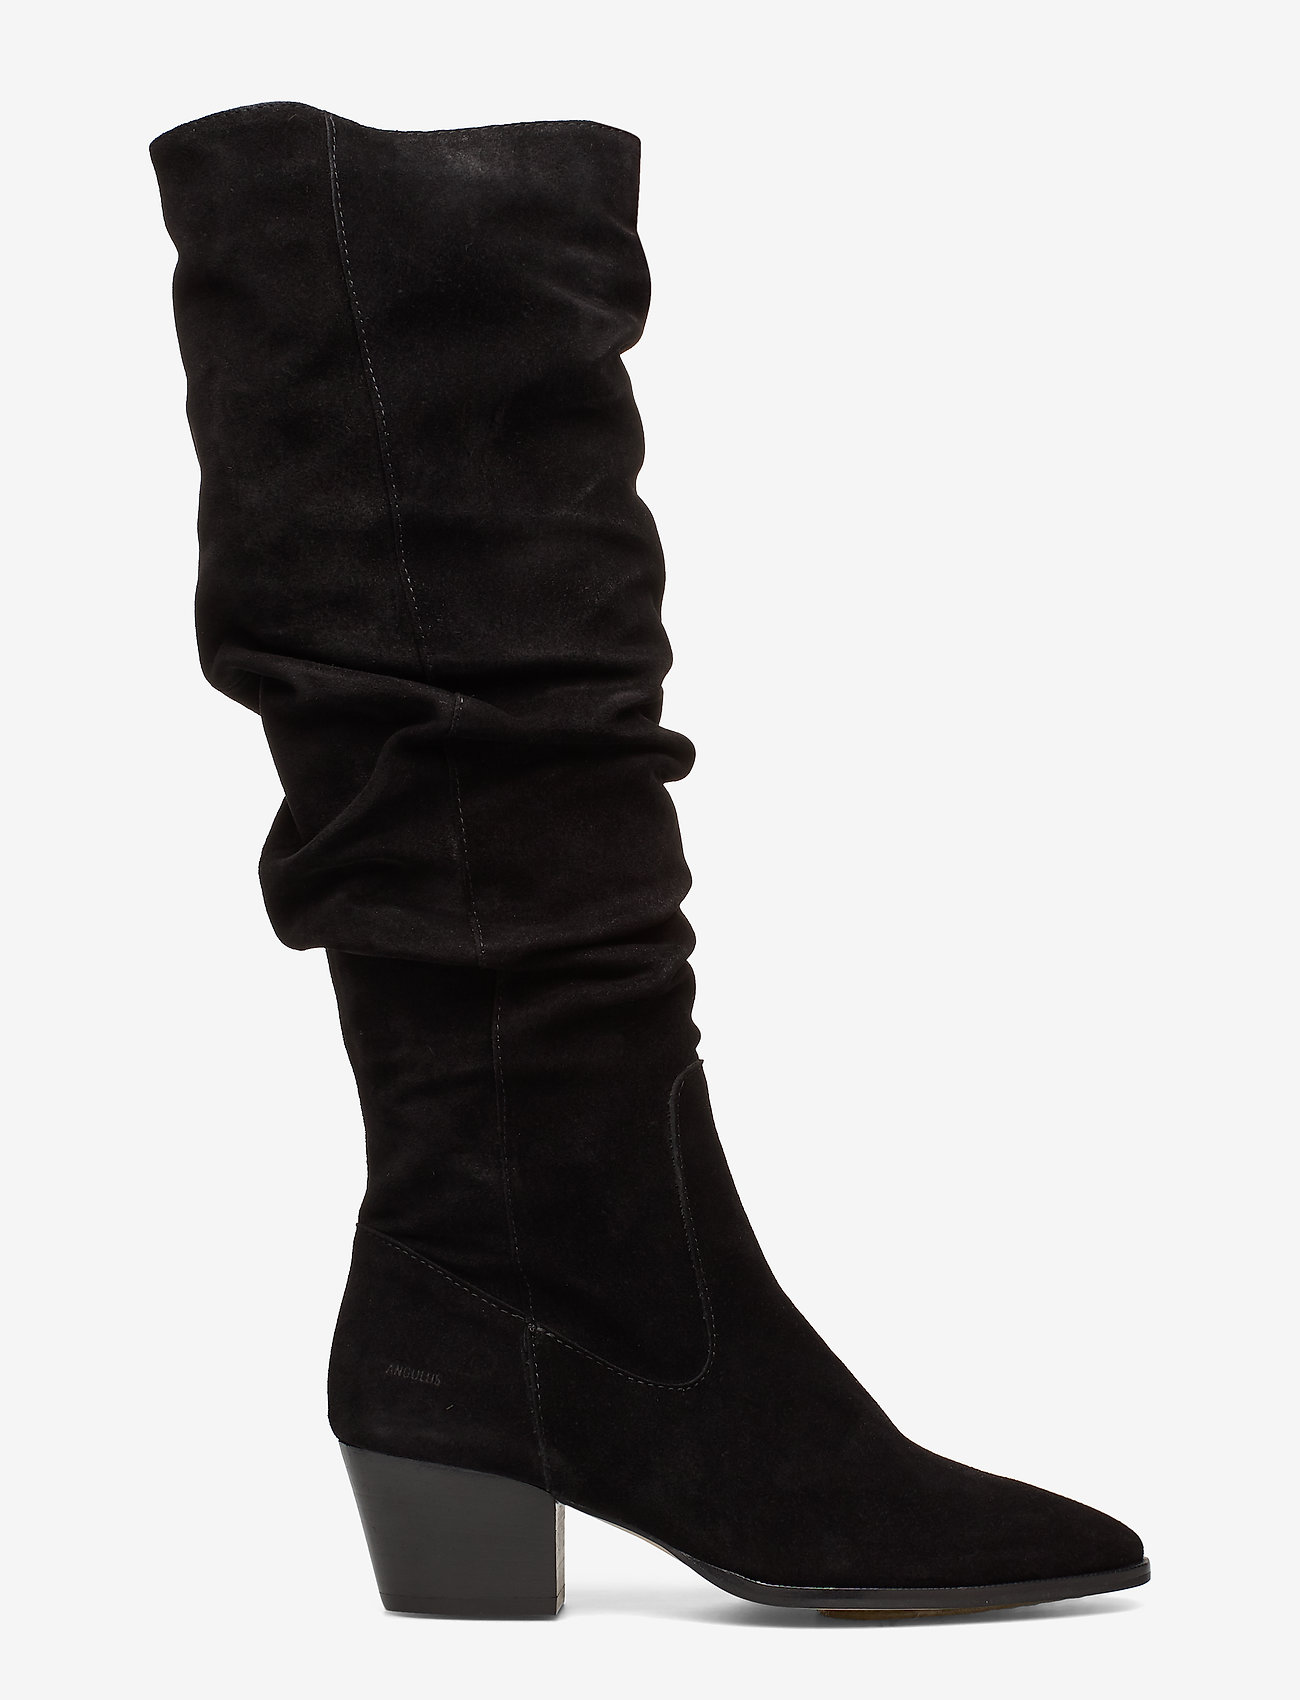 ANGULUS - Bootie - block heel - with zippe - bottes hautes - 1163 black - 1